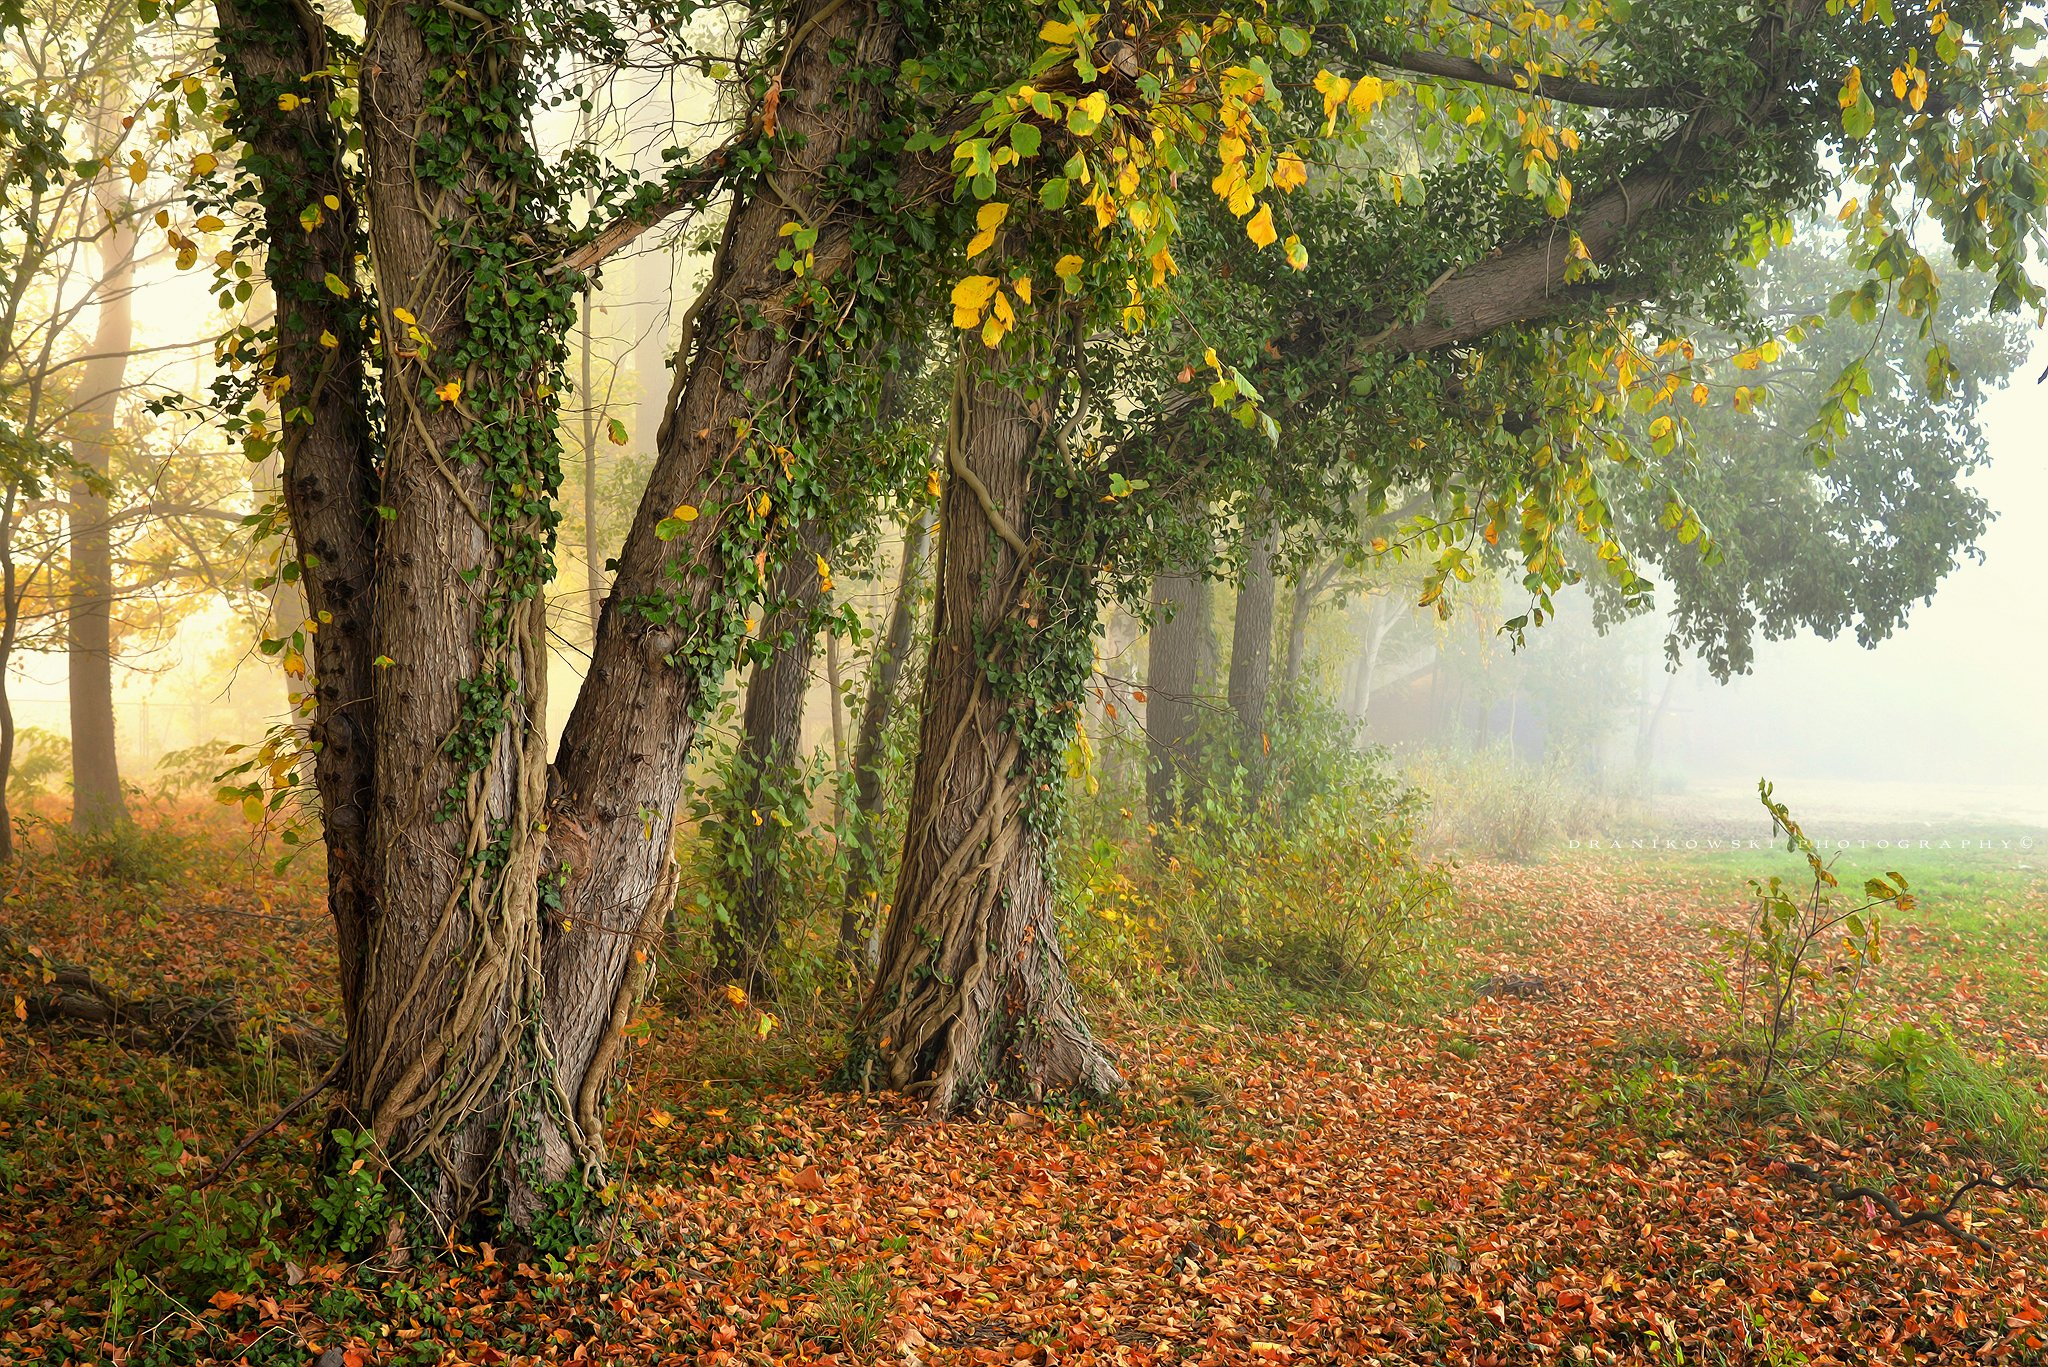 деревья trees autumn fall magic mist dranikowski drzewa fog jesien nikon, Radoslaw Dranikowski